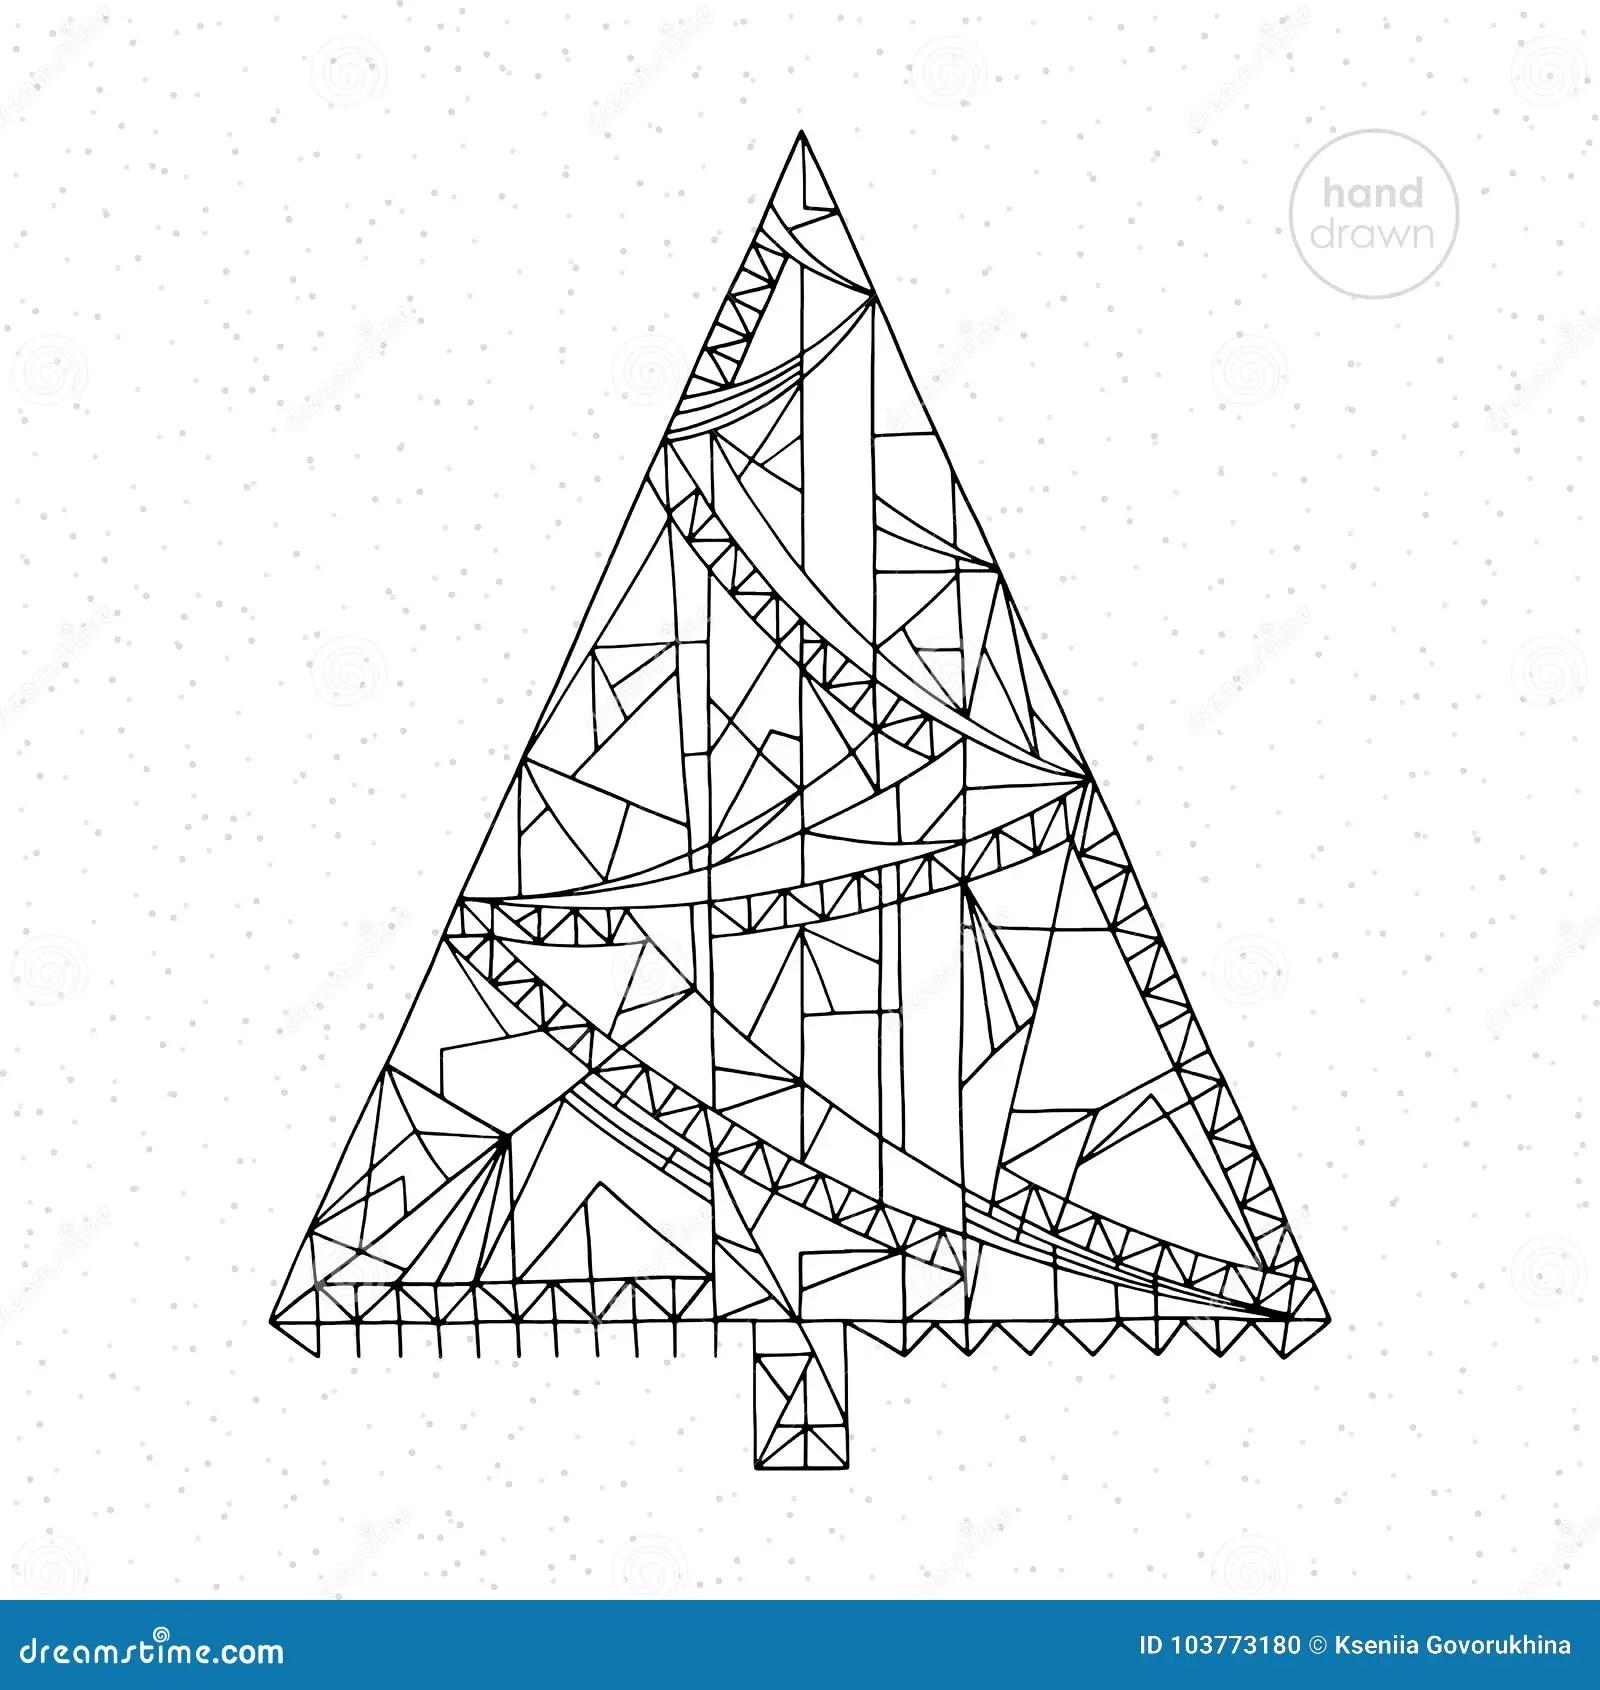 Xmas Tree Vector Illustration. Hand Drawn Abstract Winter